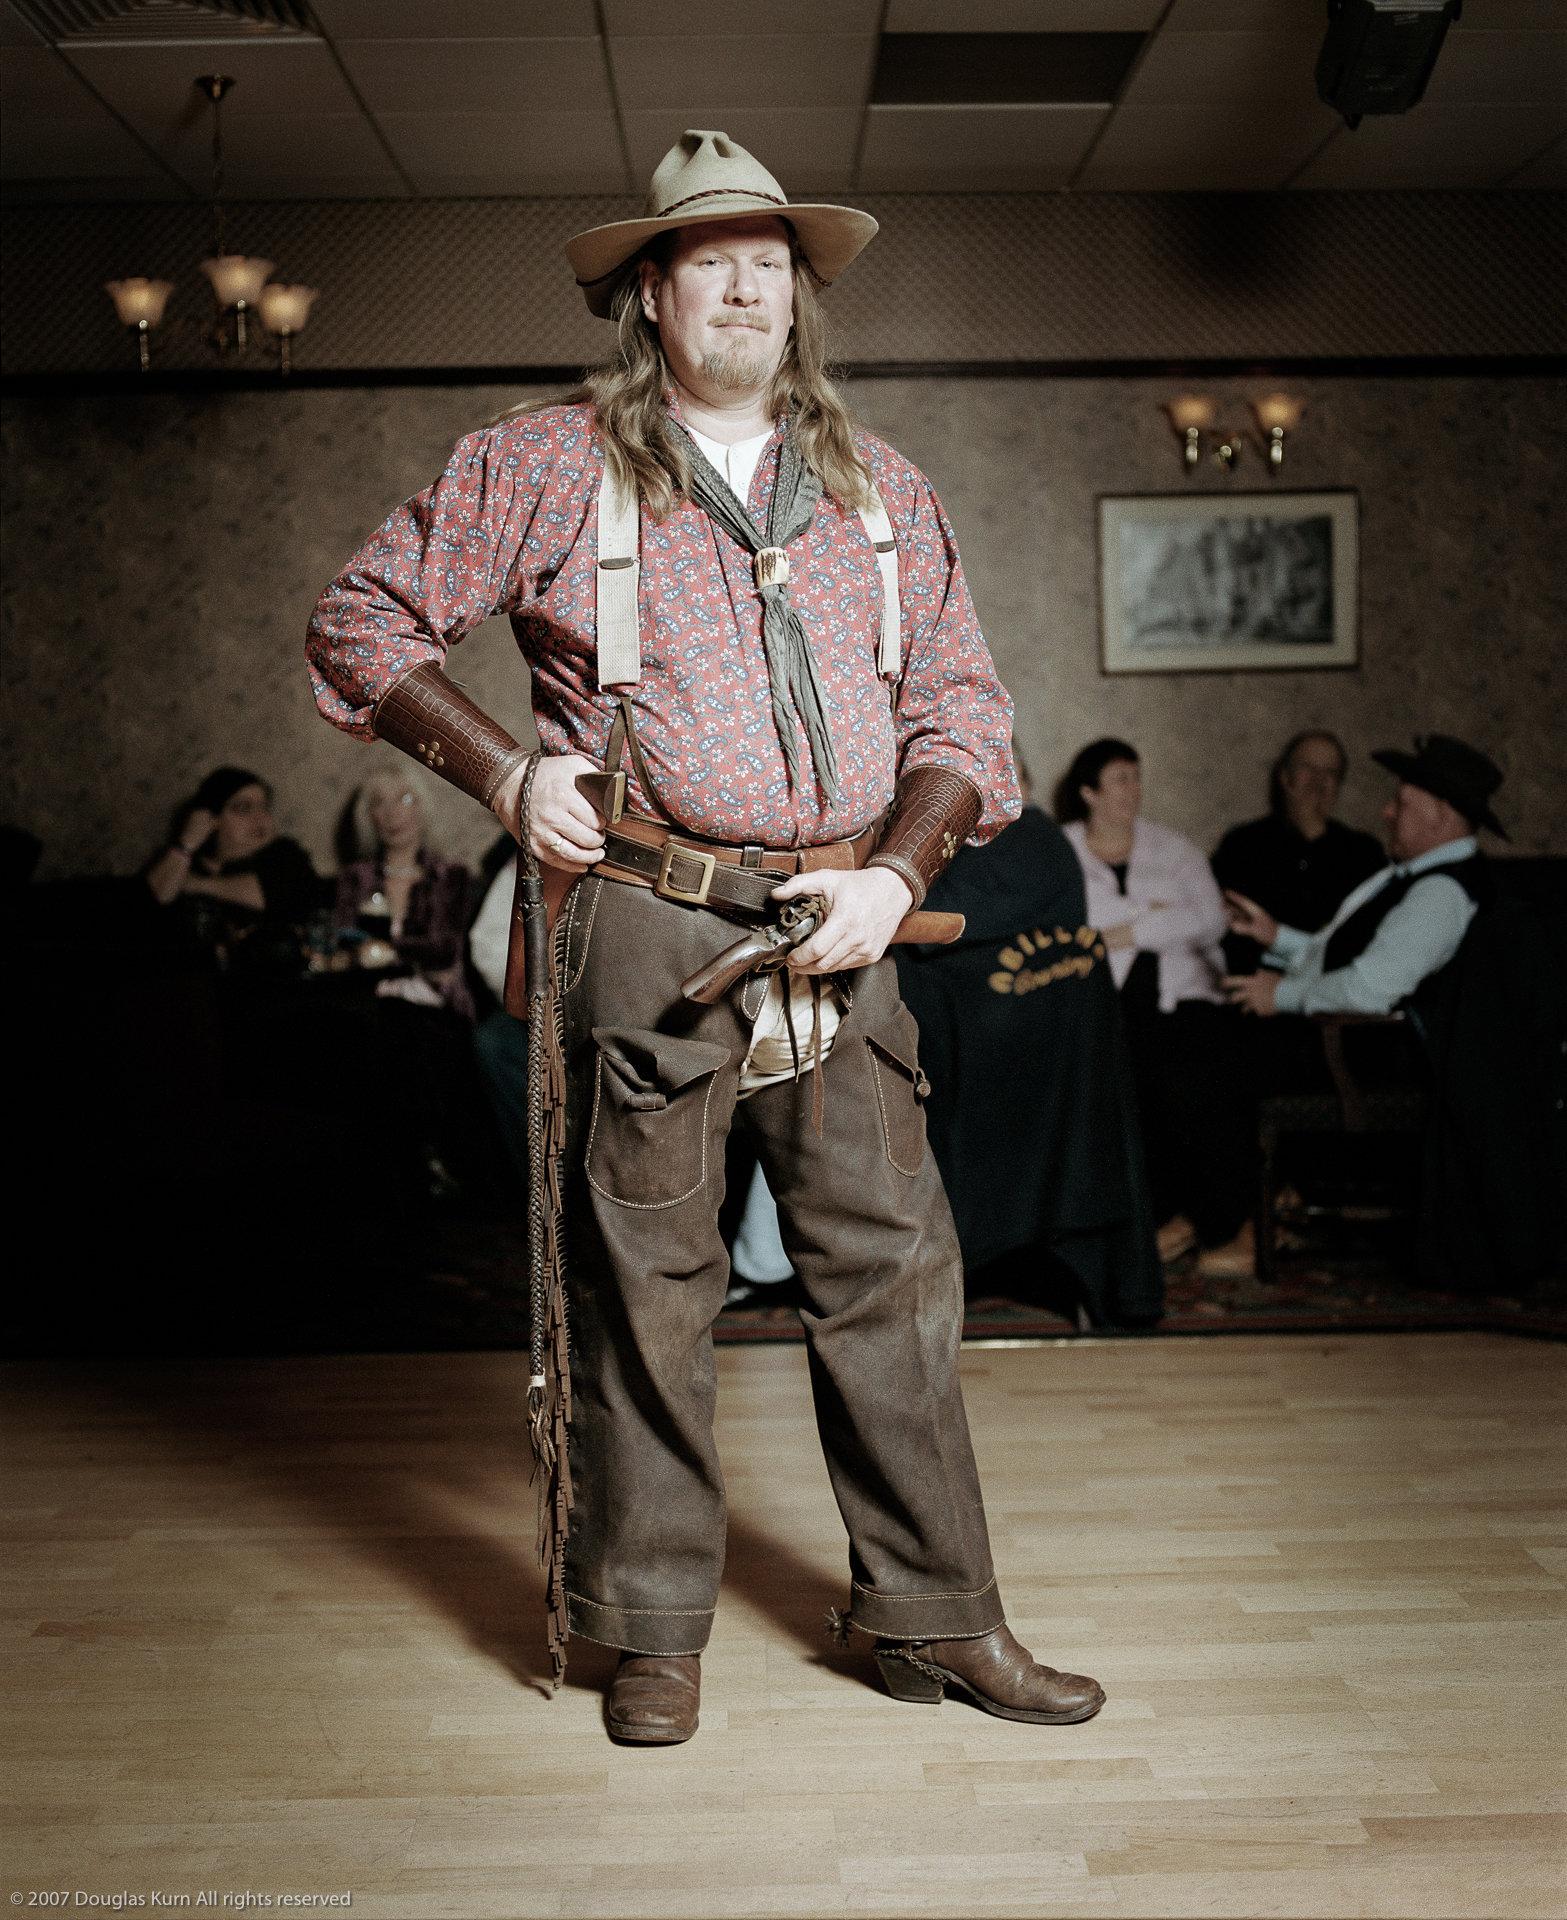 Cowboy5.jpg